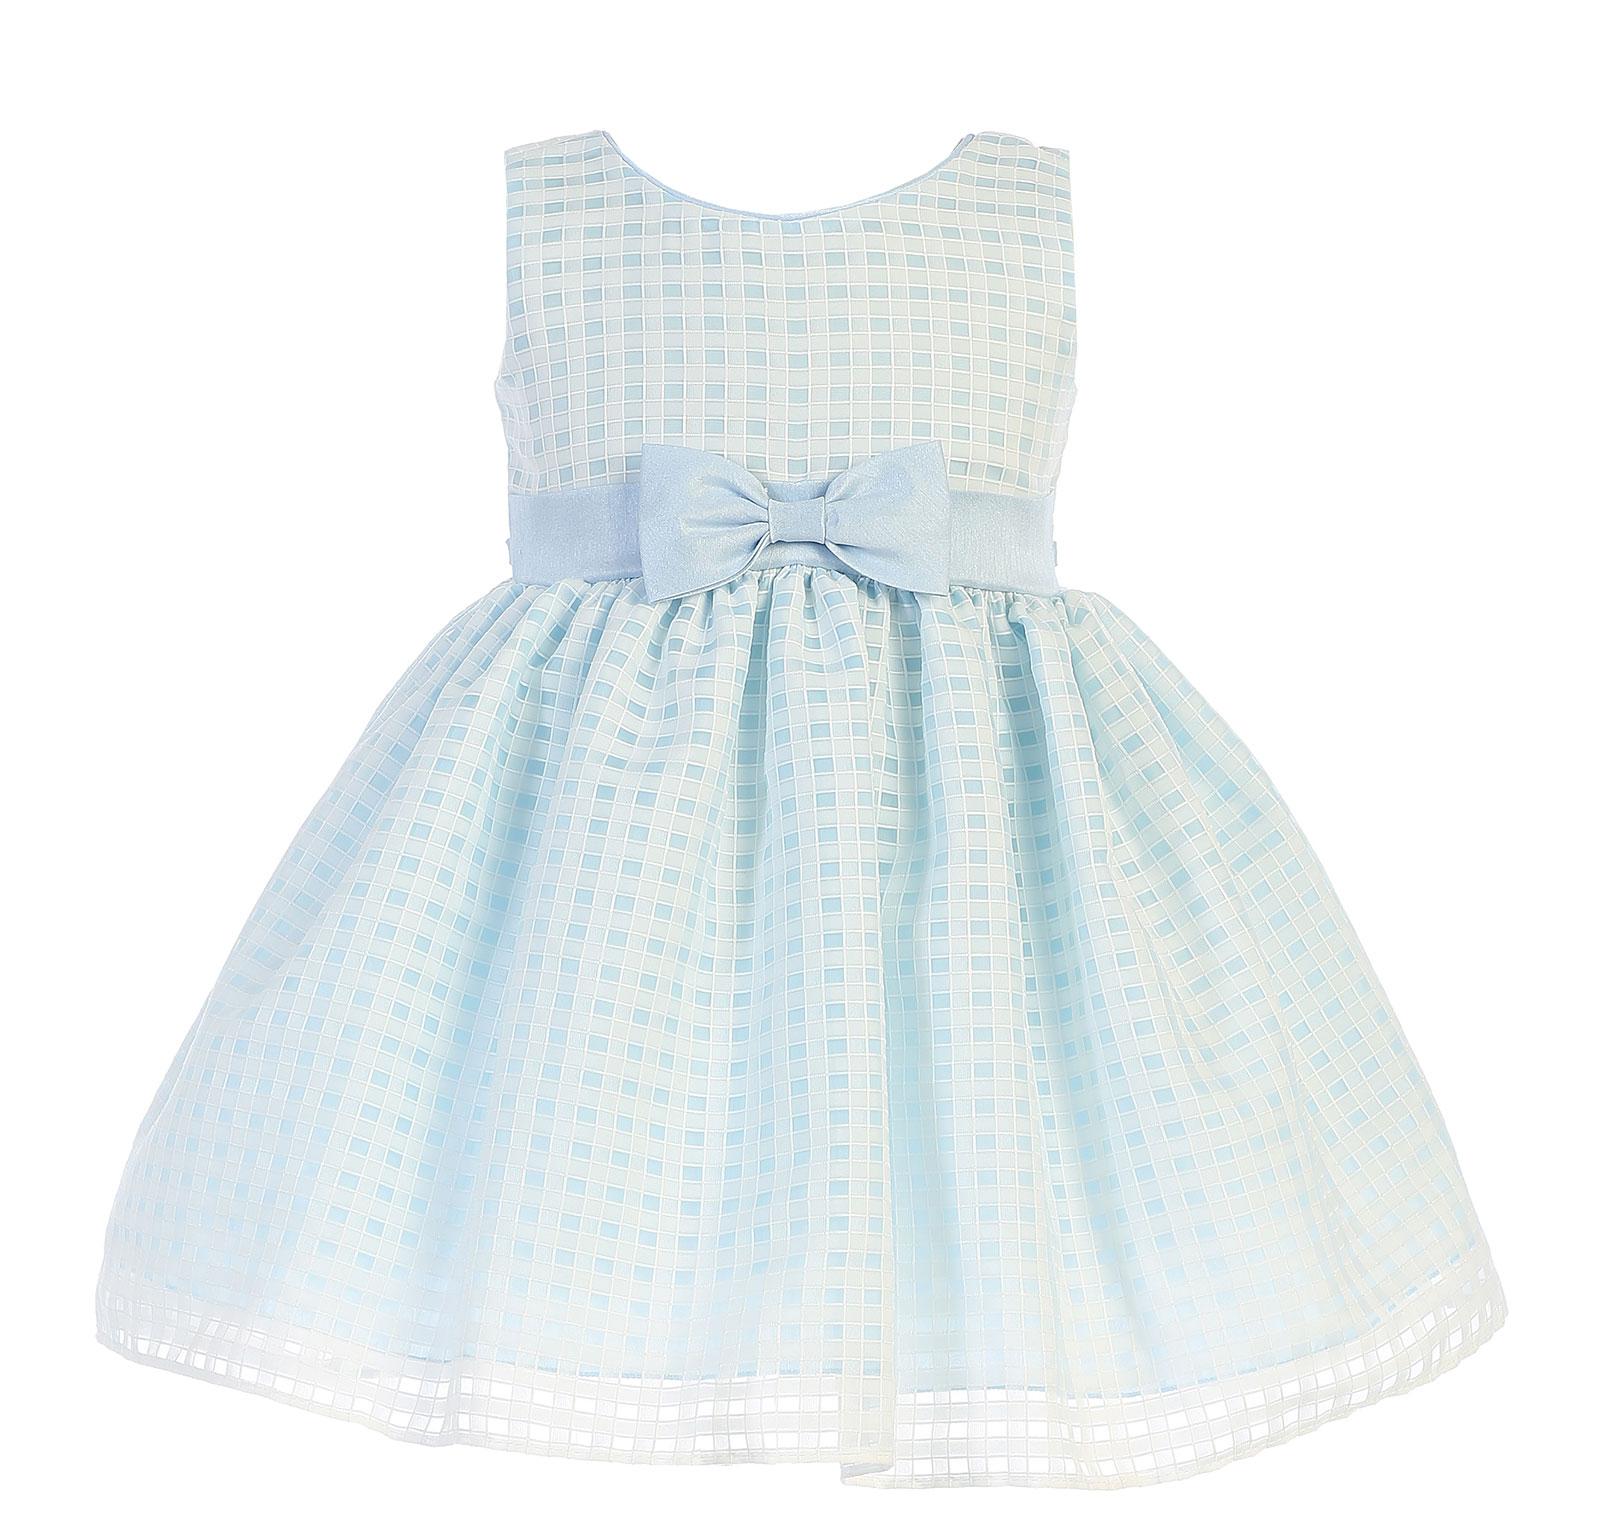 L M732LB Girls Dress Style M732 Checkered Organza Burnout Dress in Choice